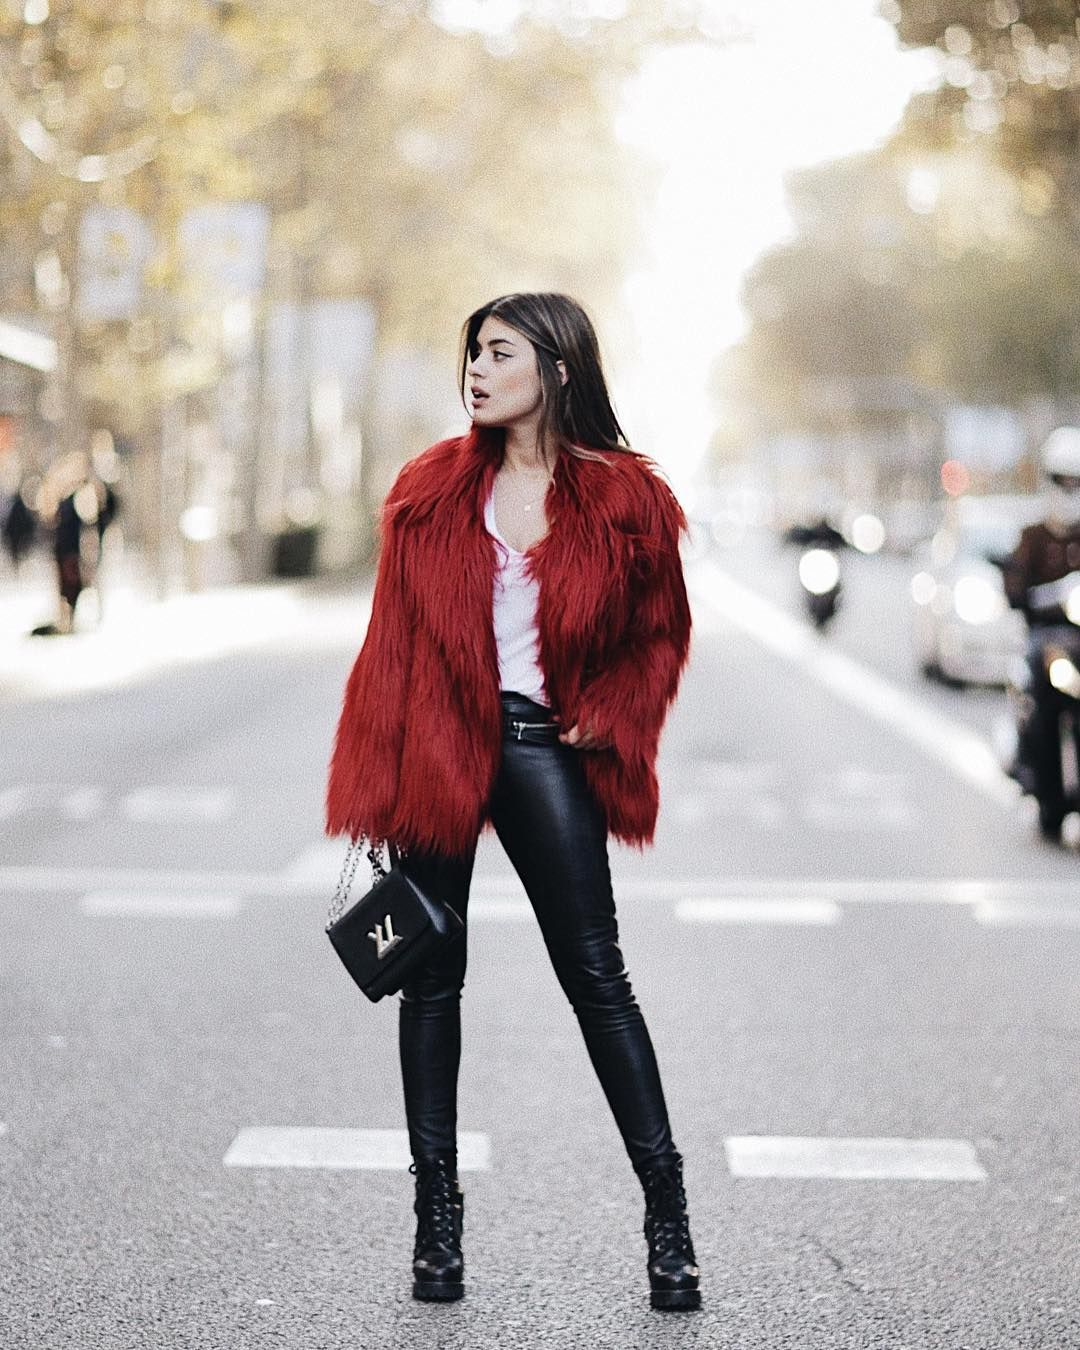 25 abrigos de pelo sintético de Zara, Mango, H&M, Stradivarius, Bershka, Bimba y Lola, Topshop